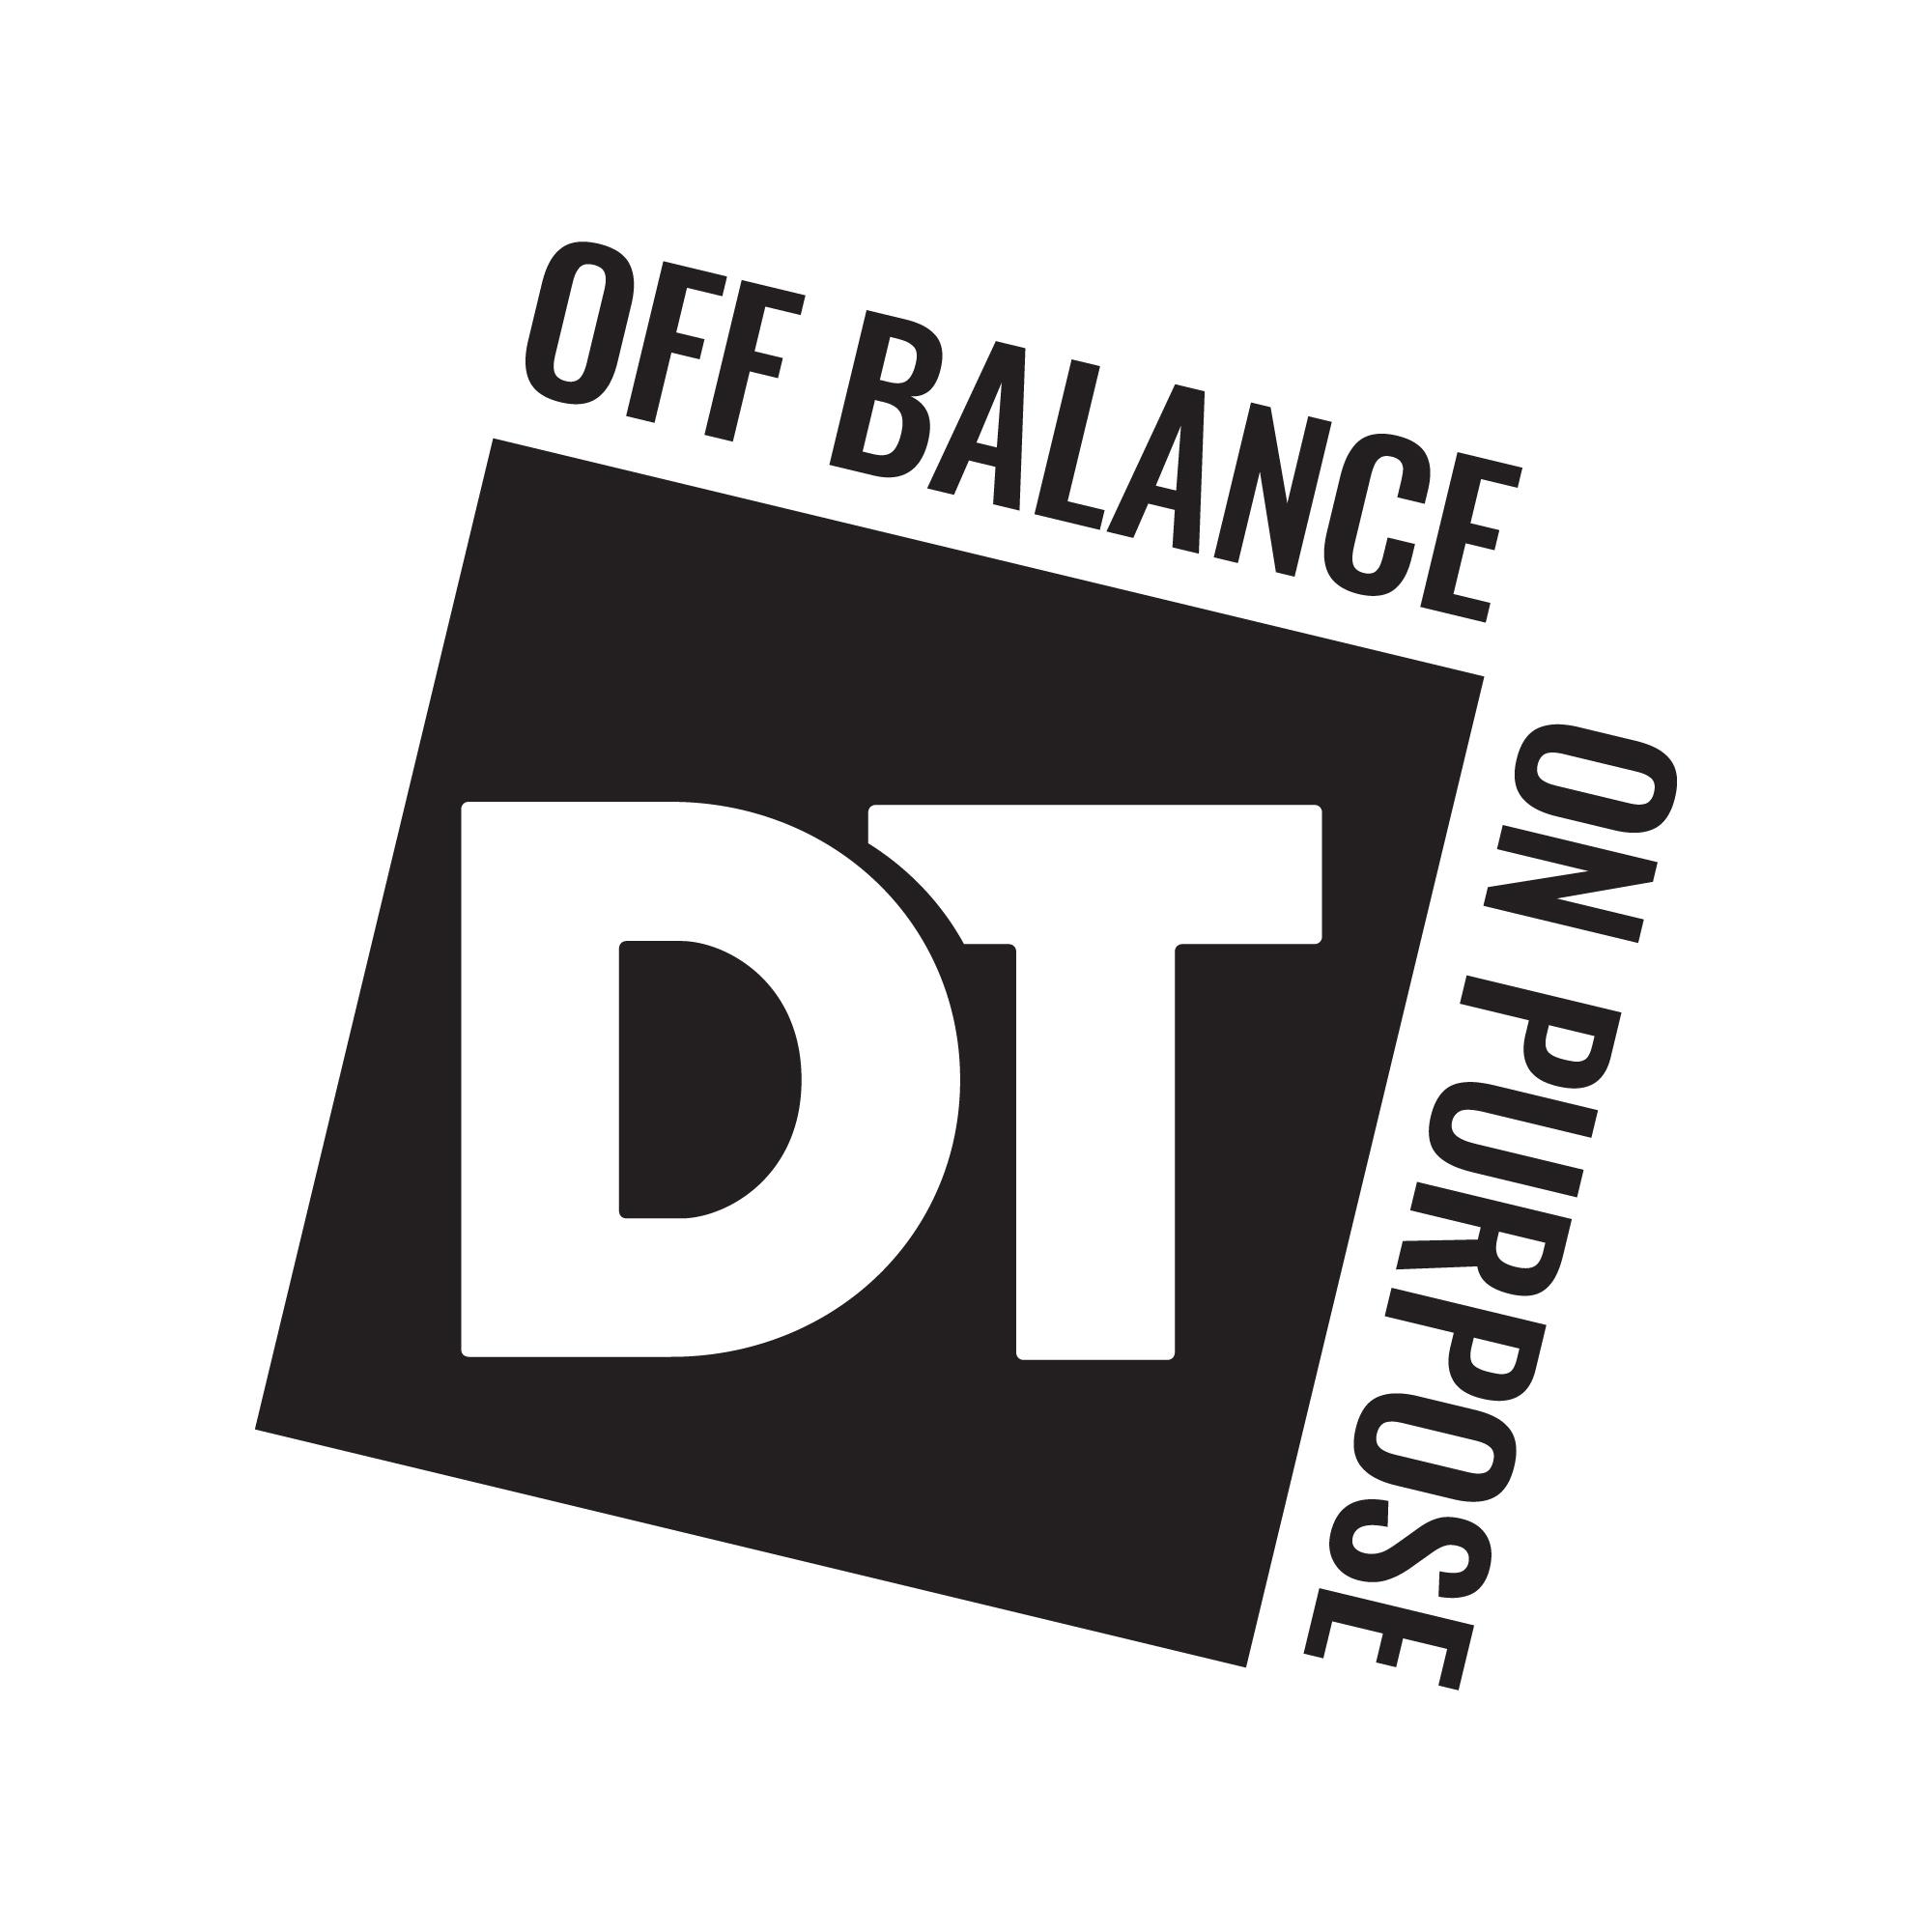 Dan Thurmon, Off Balance On Purpose show art